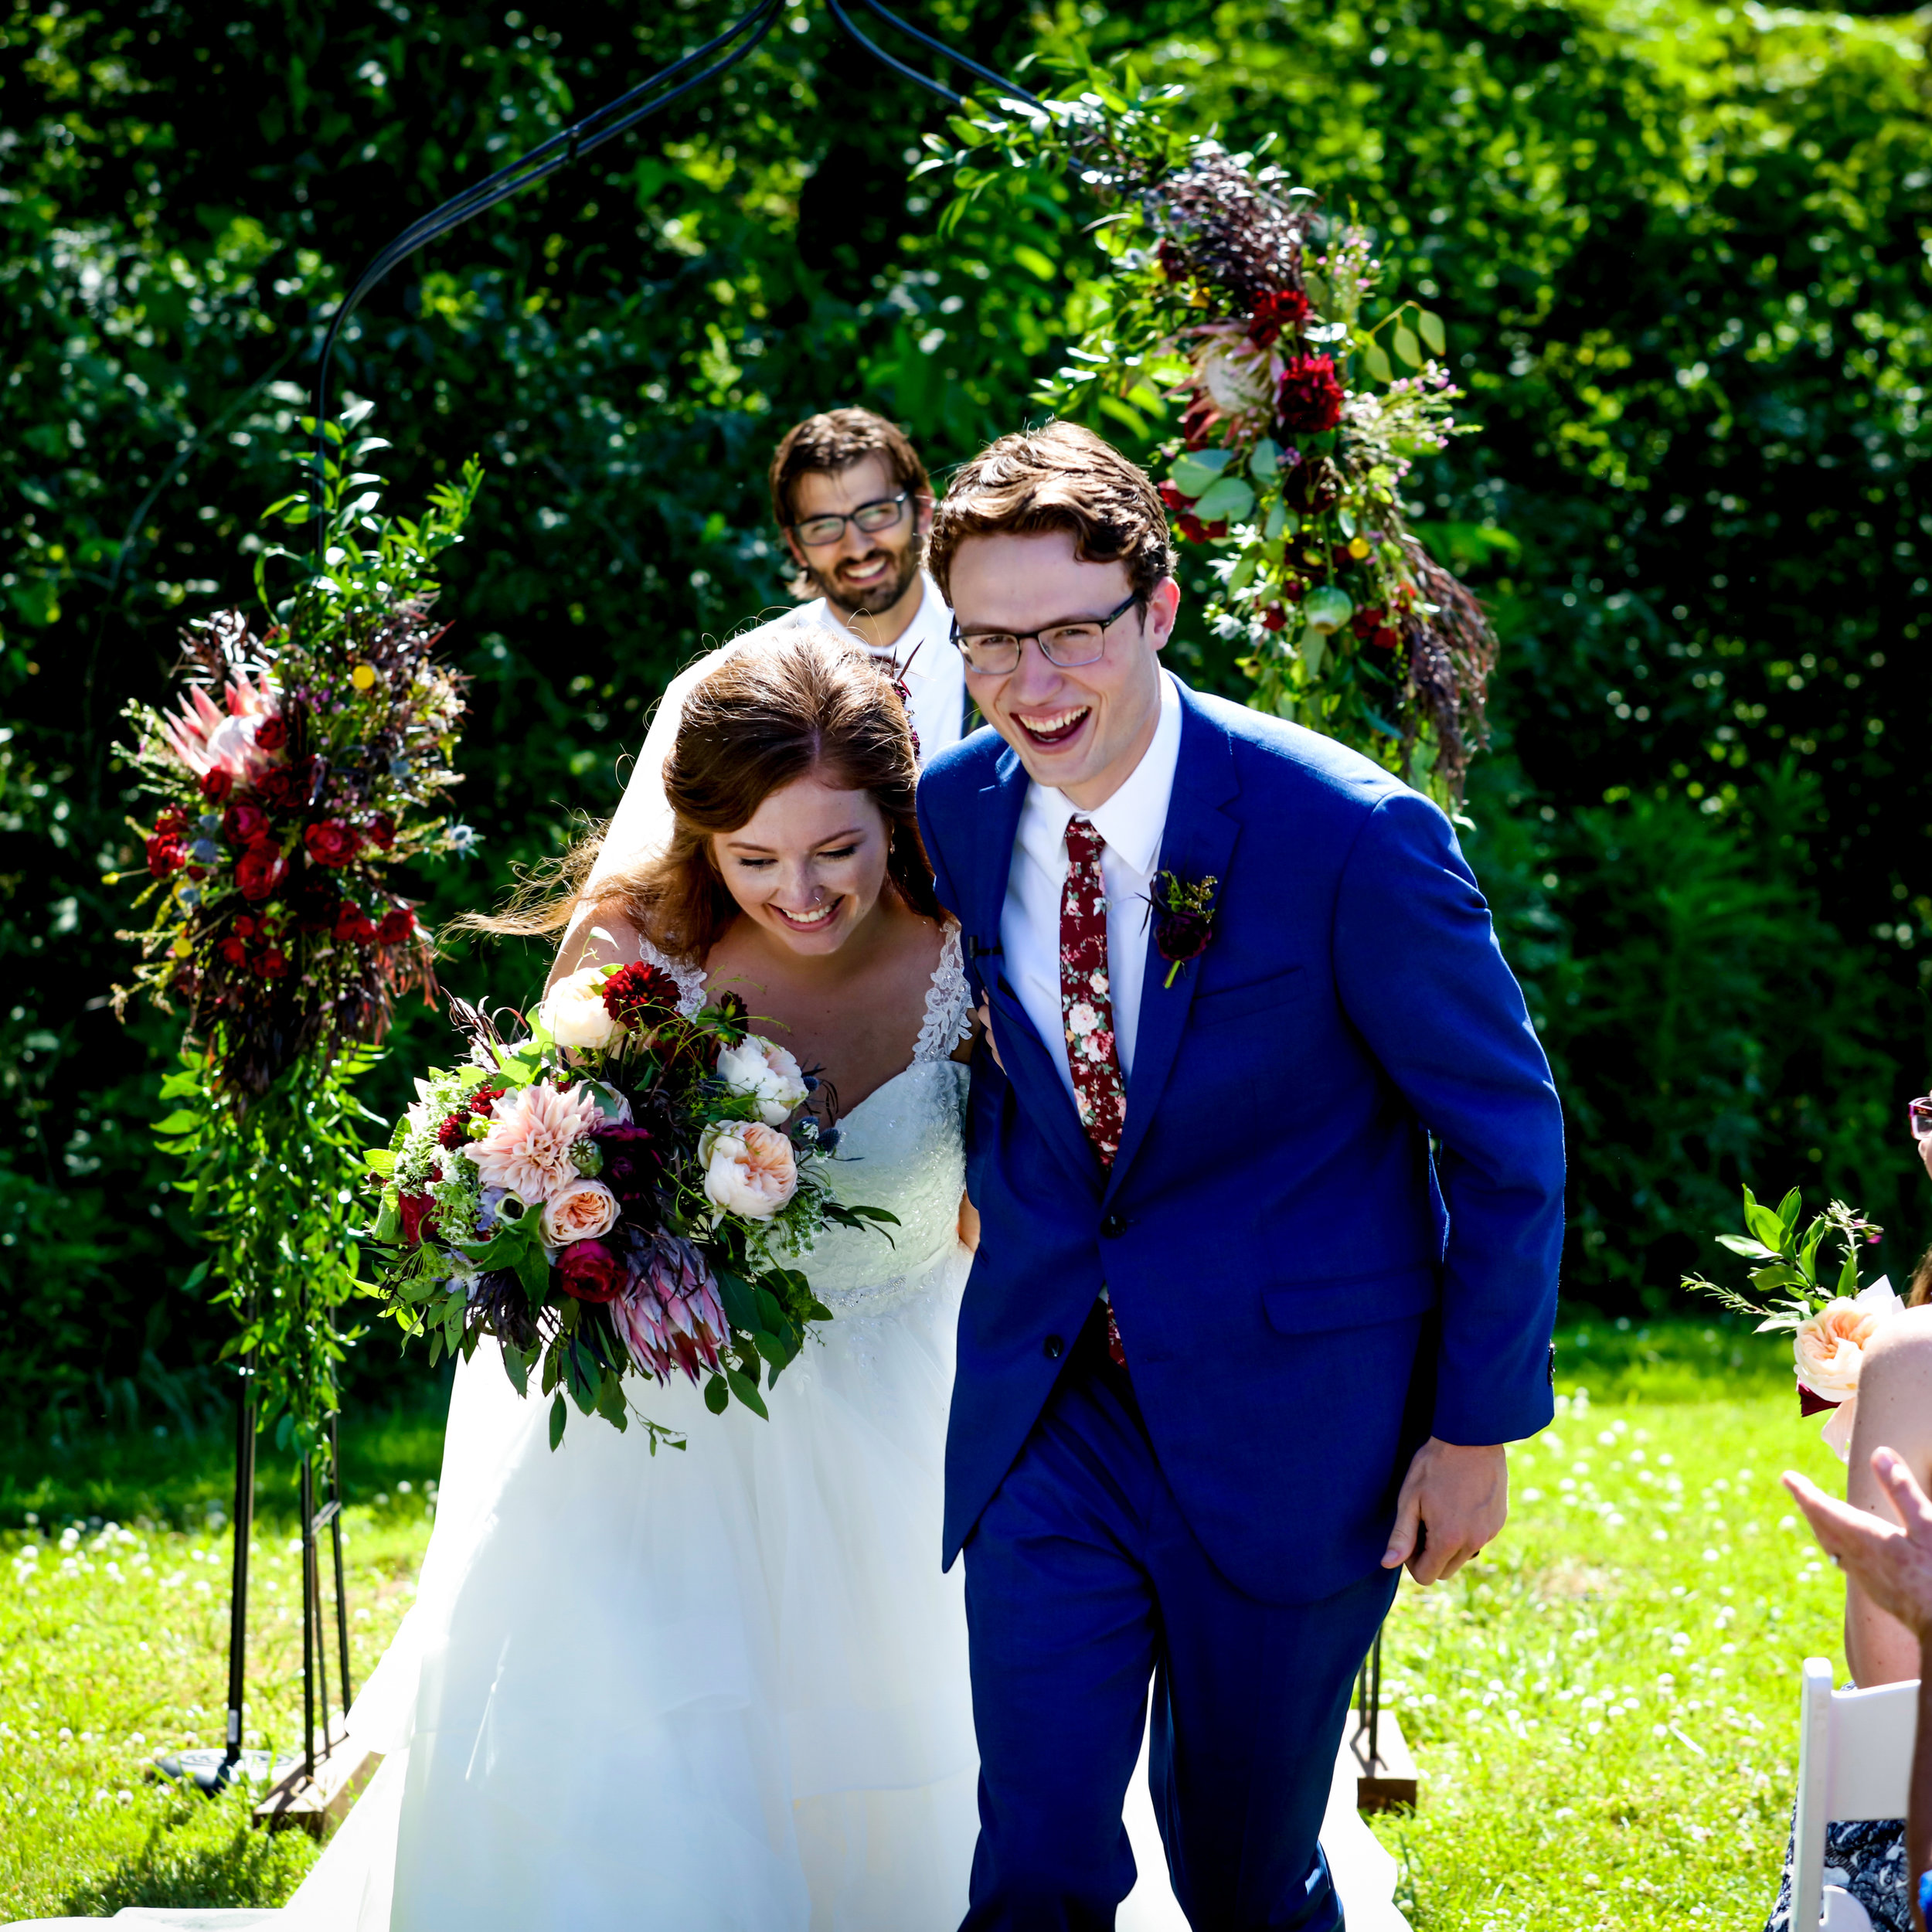 WeddingWebsite-39.jpg